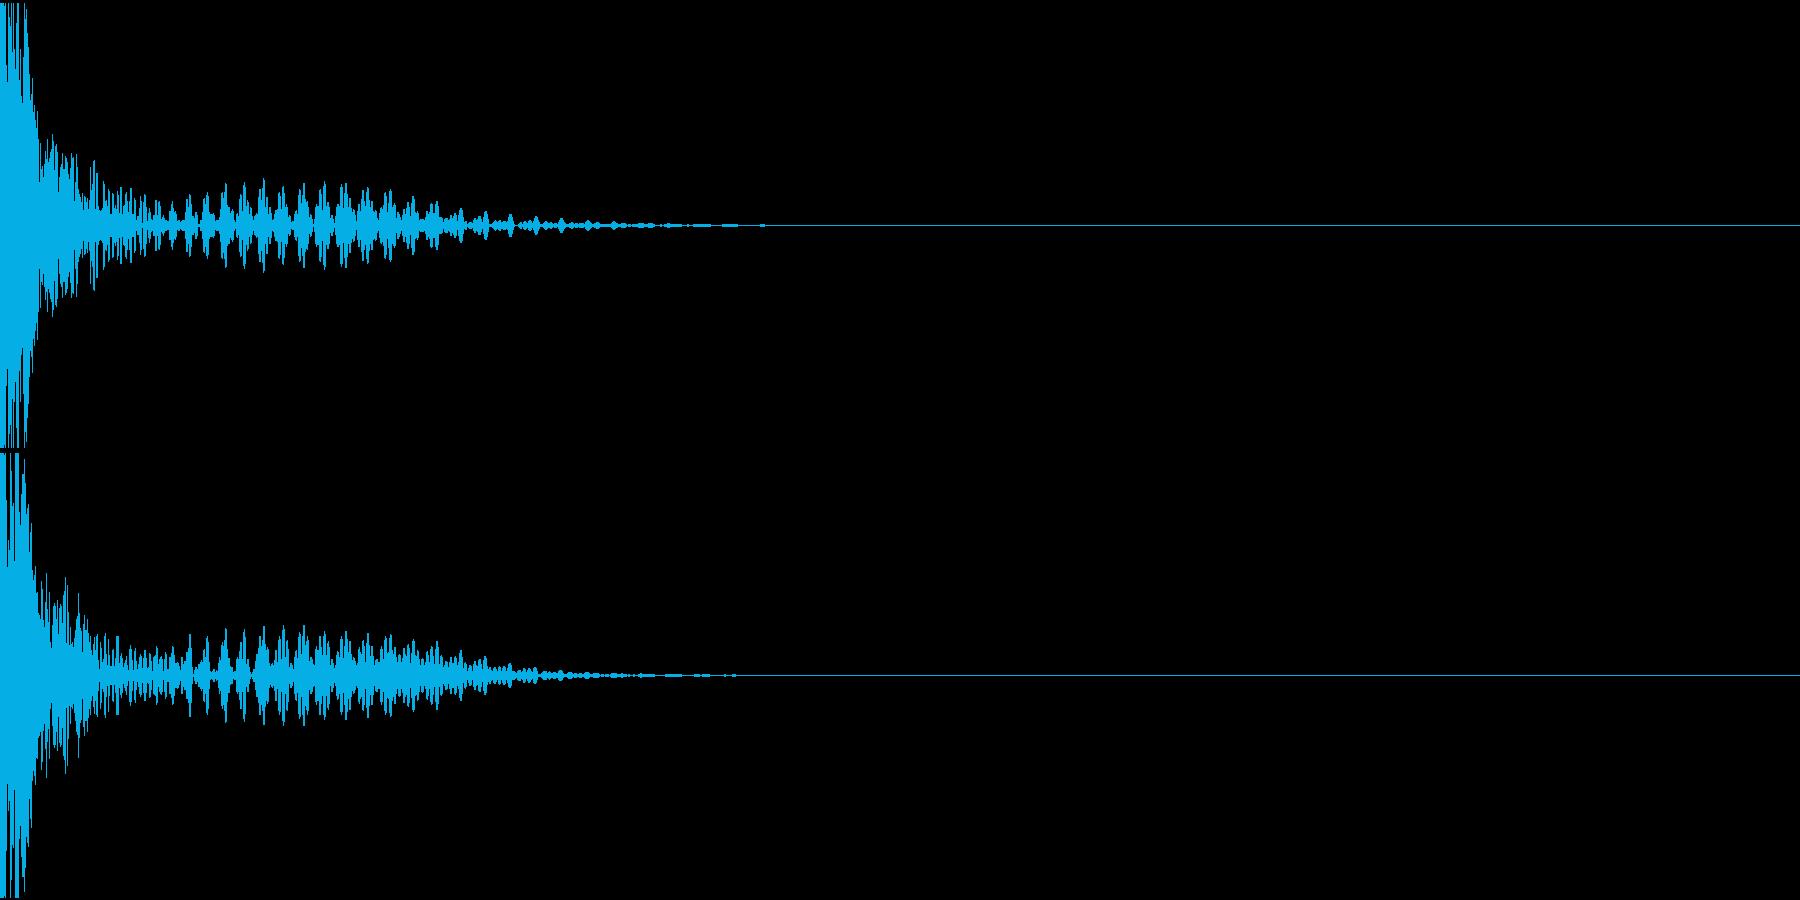 Rifle レーザーライフル ショット音の再生済みの波形